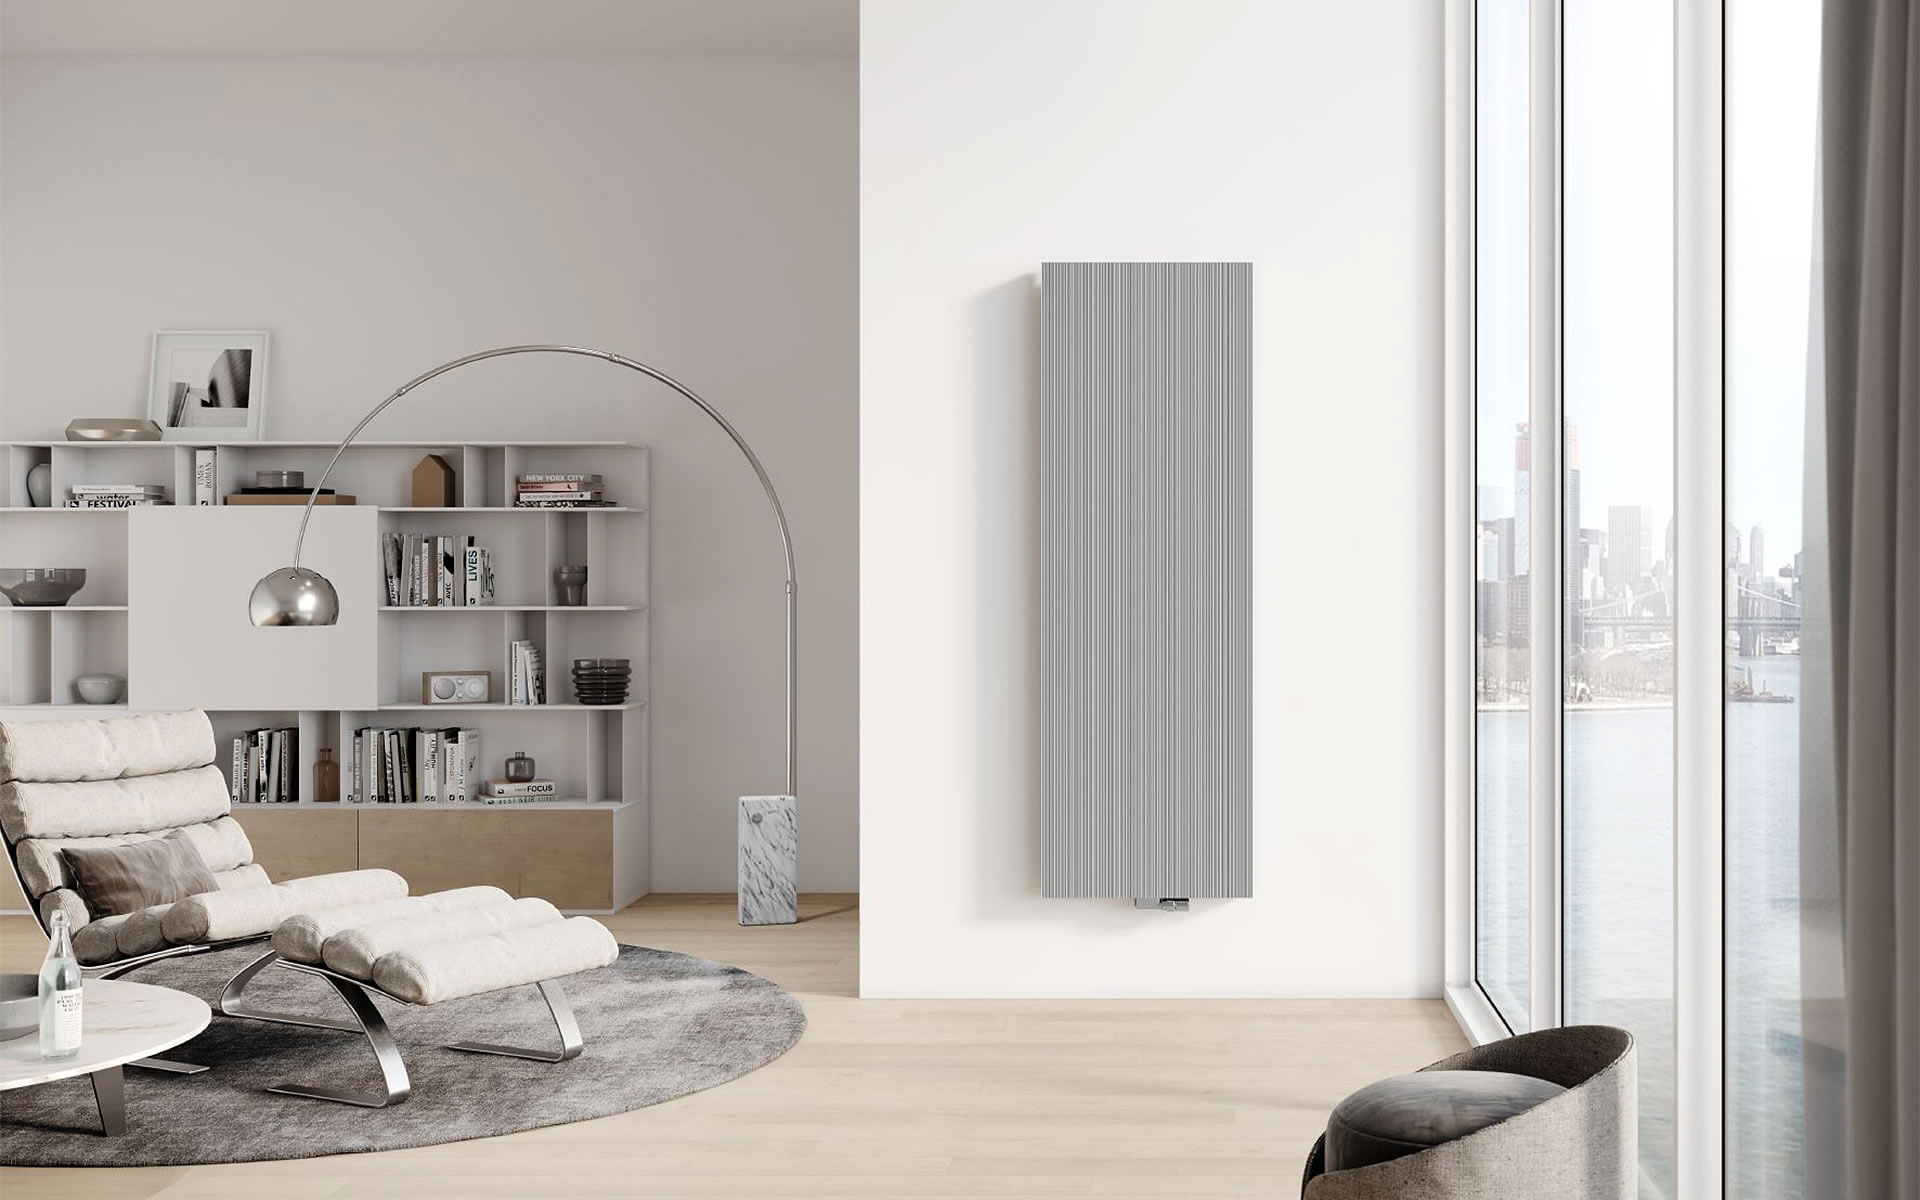 Full Size of Haustechnik 73 Elektroheizkörper Bad Heizkörper Badezimmer Wohnzimmer Für Wohnzimmer Kermi Heizkörper